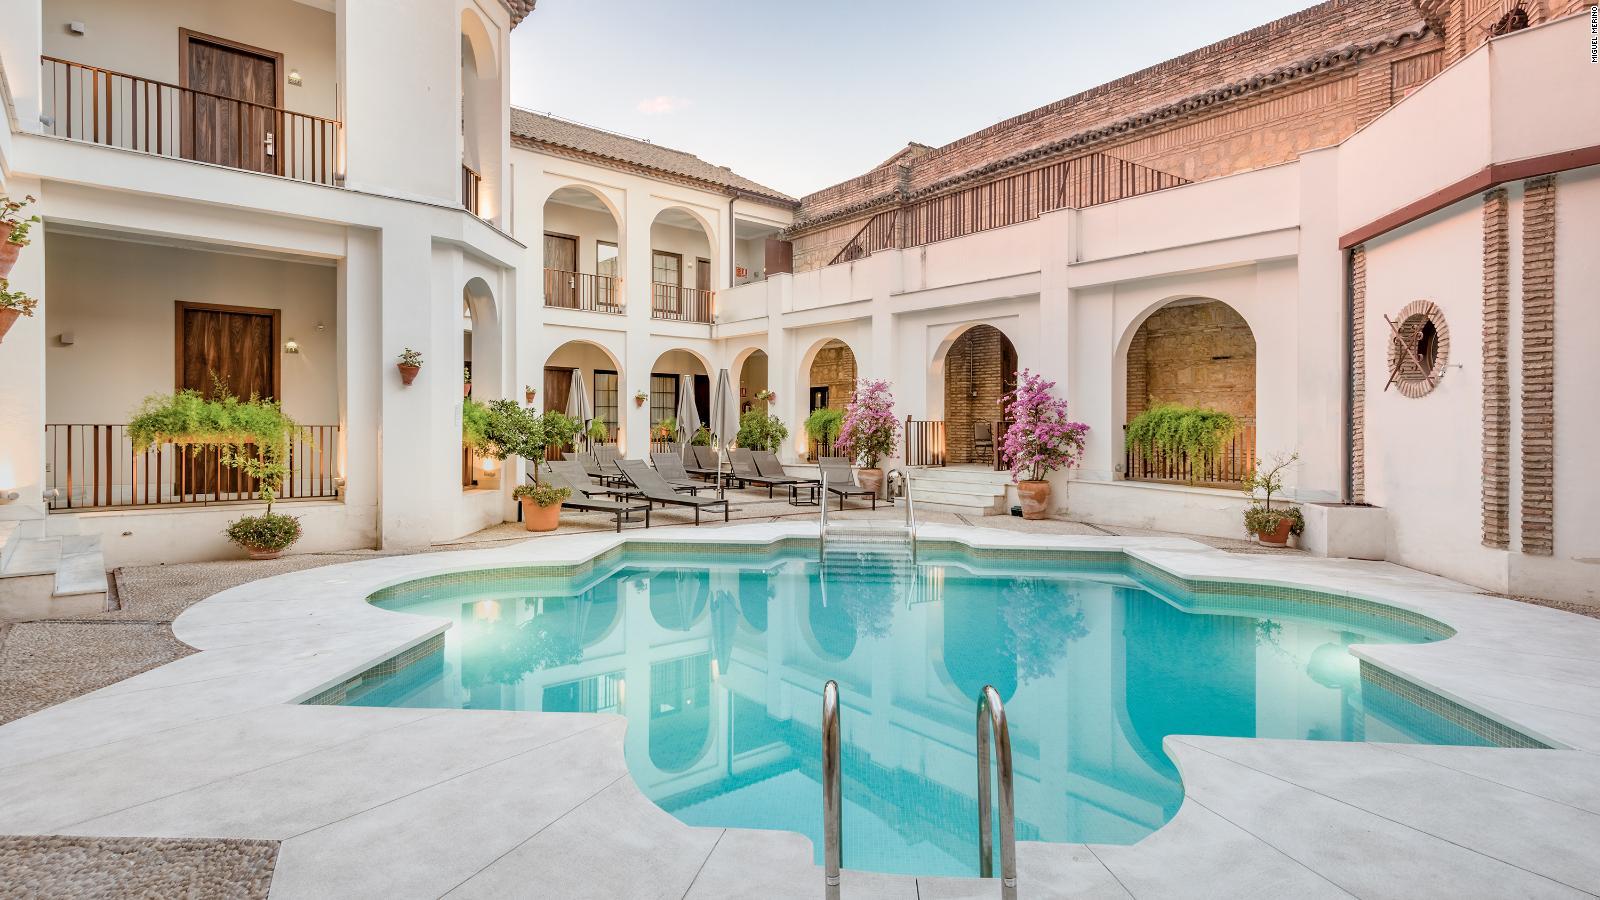 91e6d30c102 Cordoba, Spain, has the most UNESCO World Heritage Sites | CNN Travel